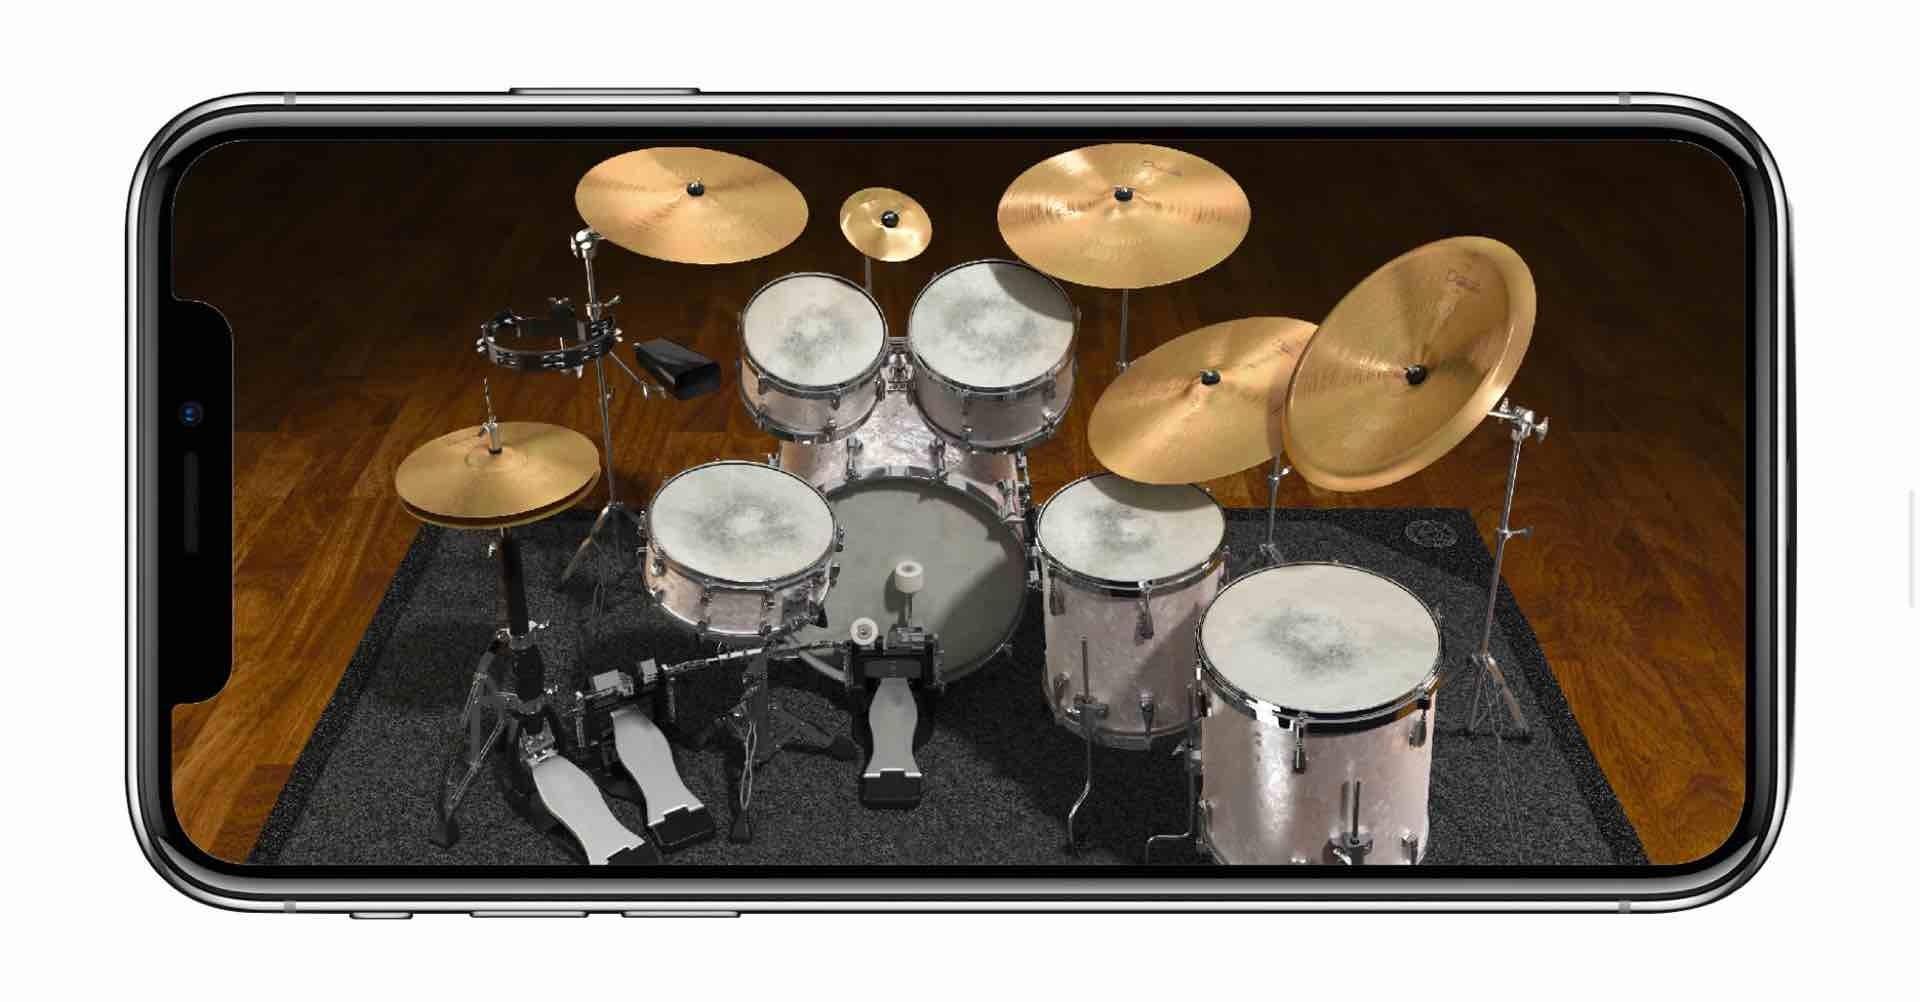 redison-senstroke-drumming-sensors-app